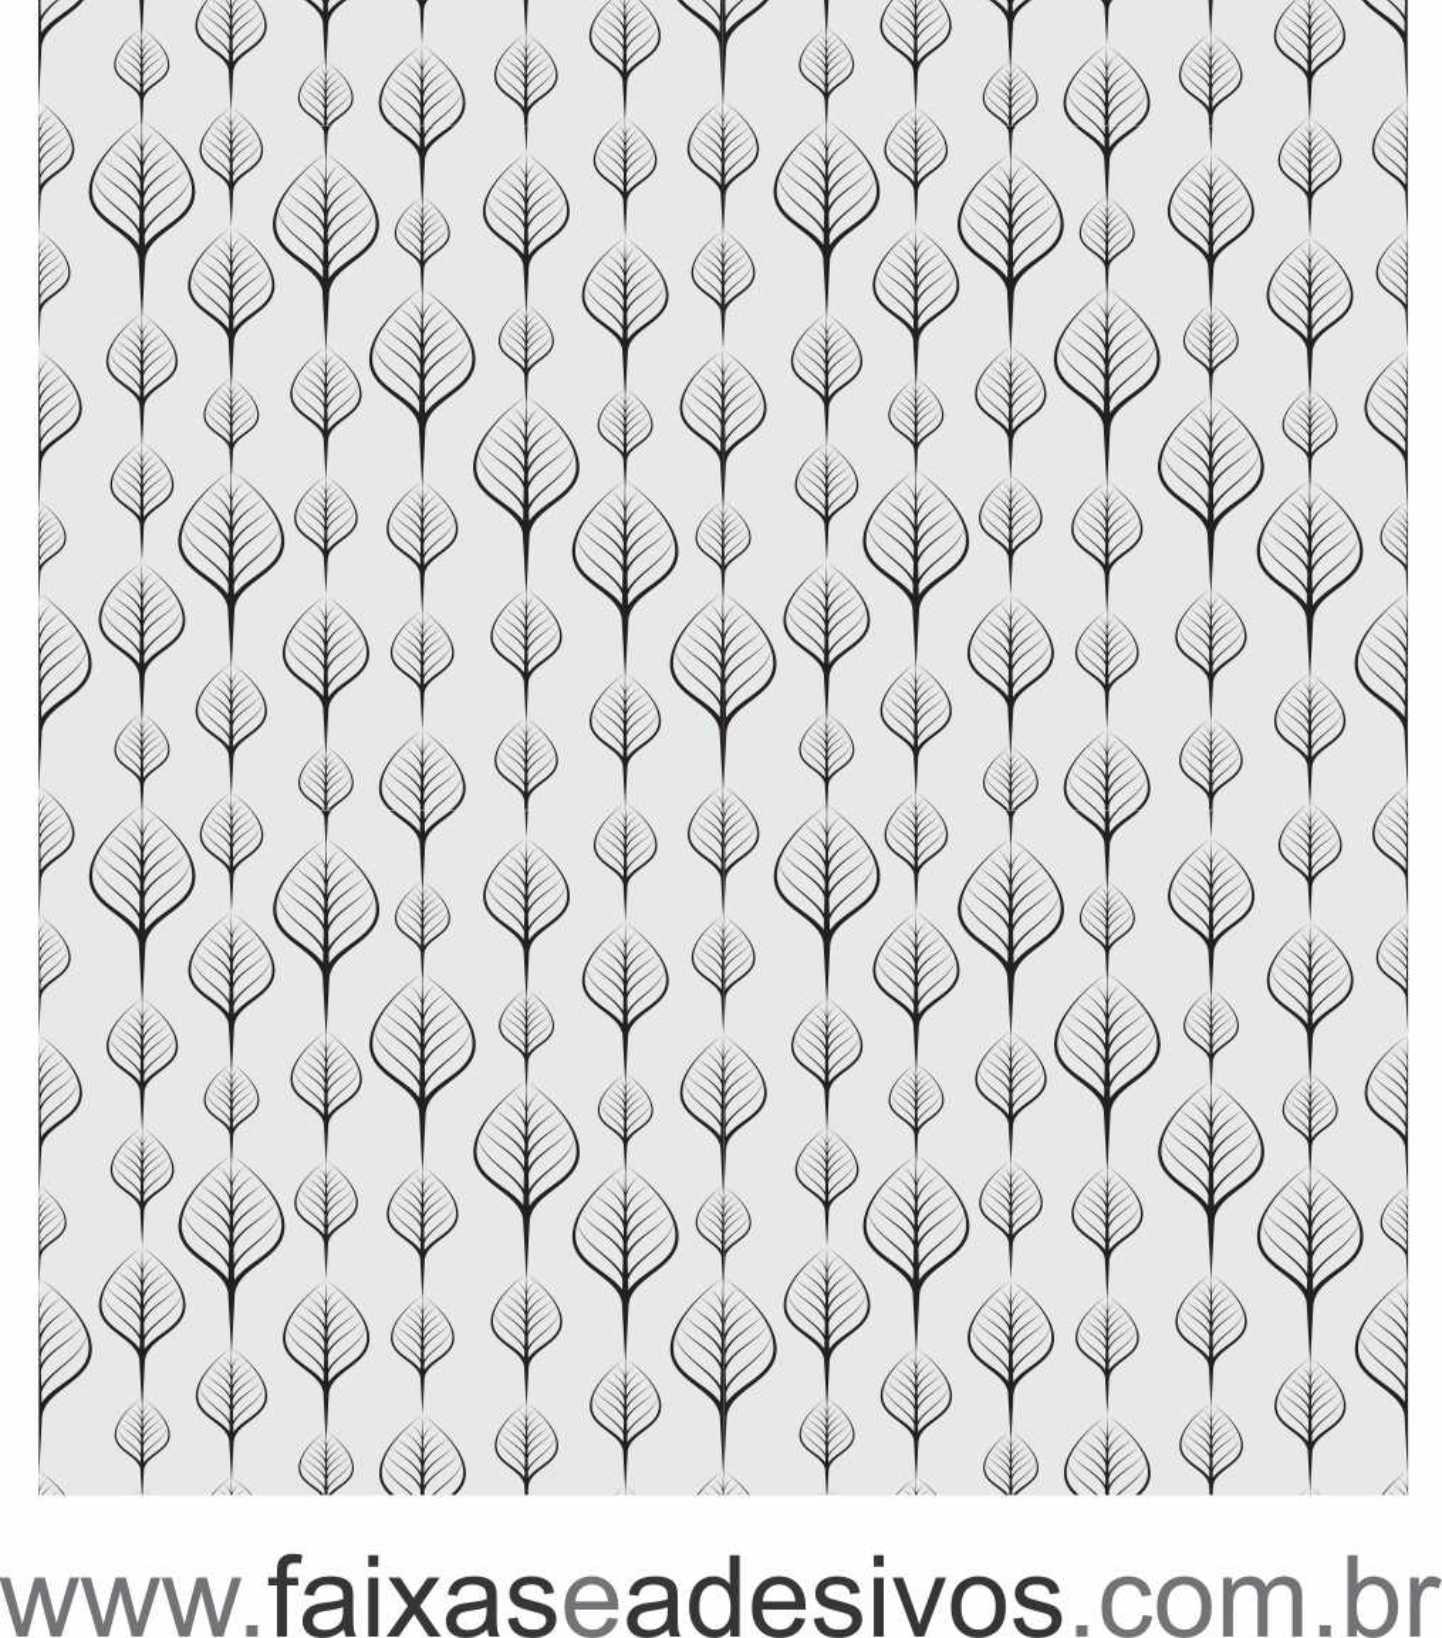 064 VD - Adesivo Jateado para vidro Folhas  220x70cm  - Fac Signs